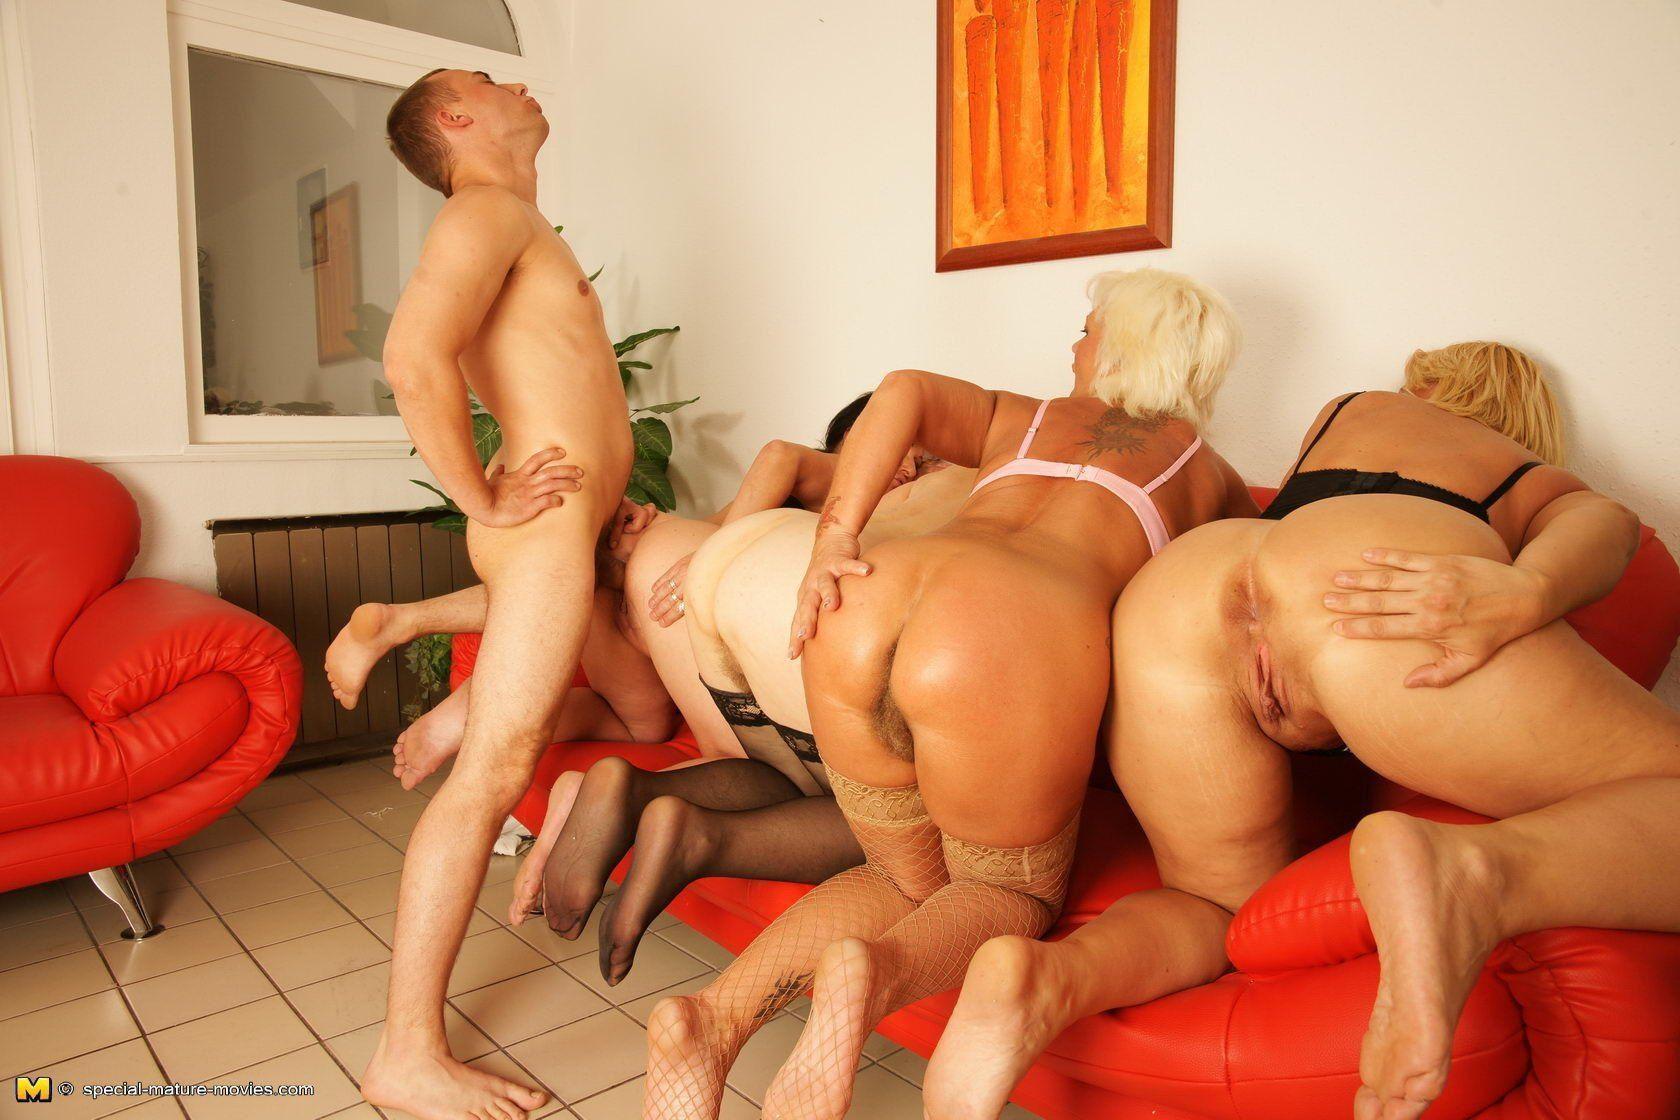 Free drunk orgy movie new porn photos